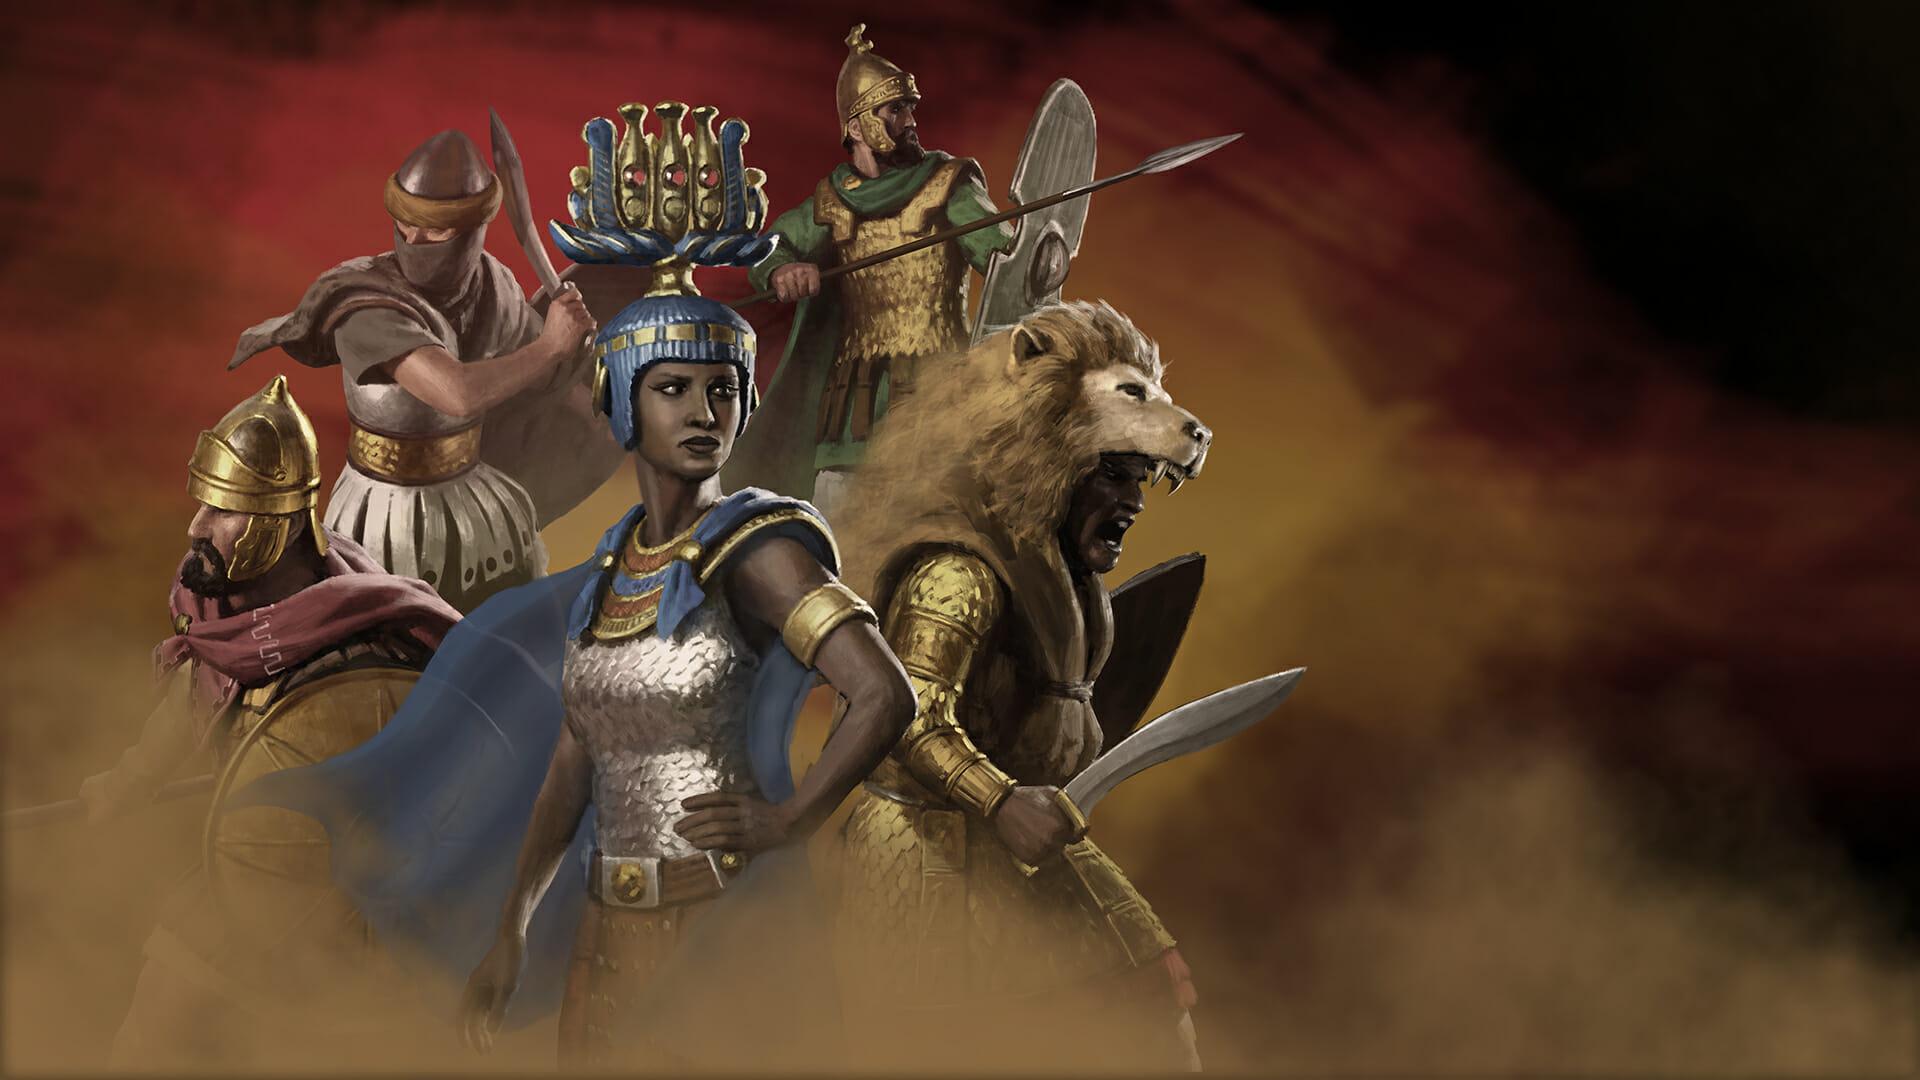 medieval 2 total war kingdoms expansion download tpb